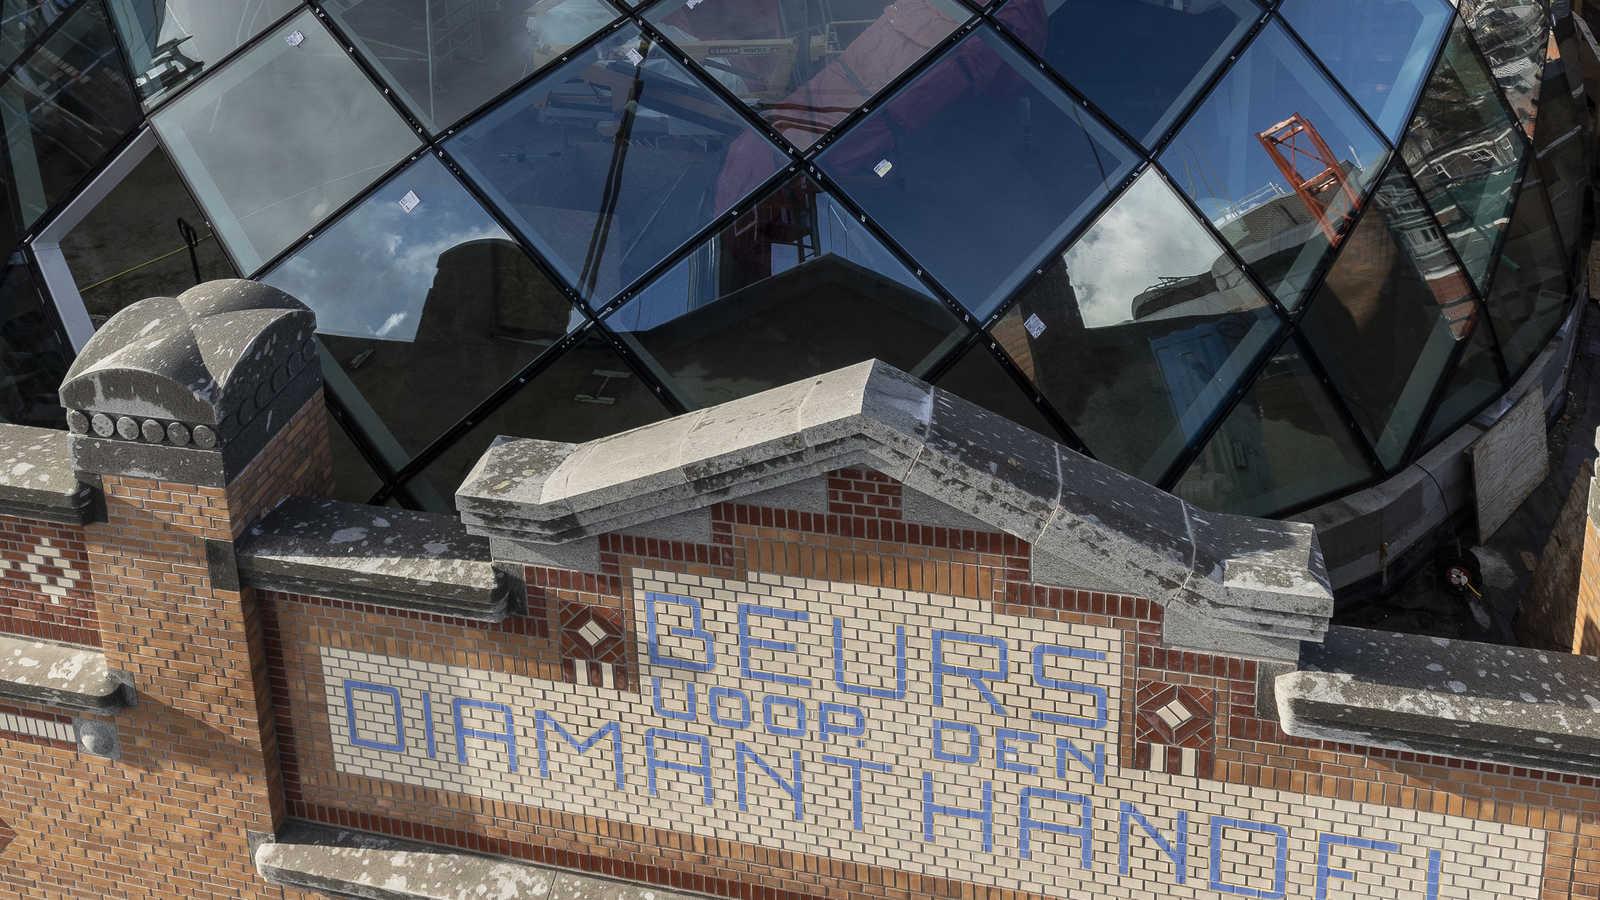 Capital C Diamond Exchange Amsterdam Zwarts Jansma Architects